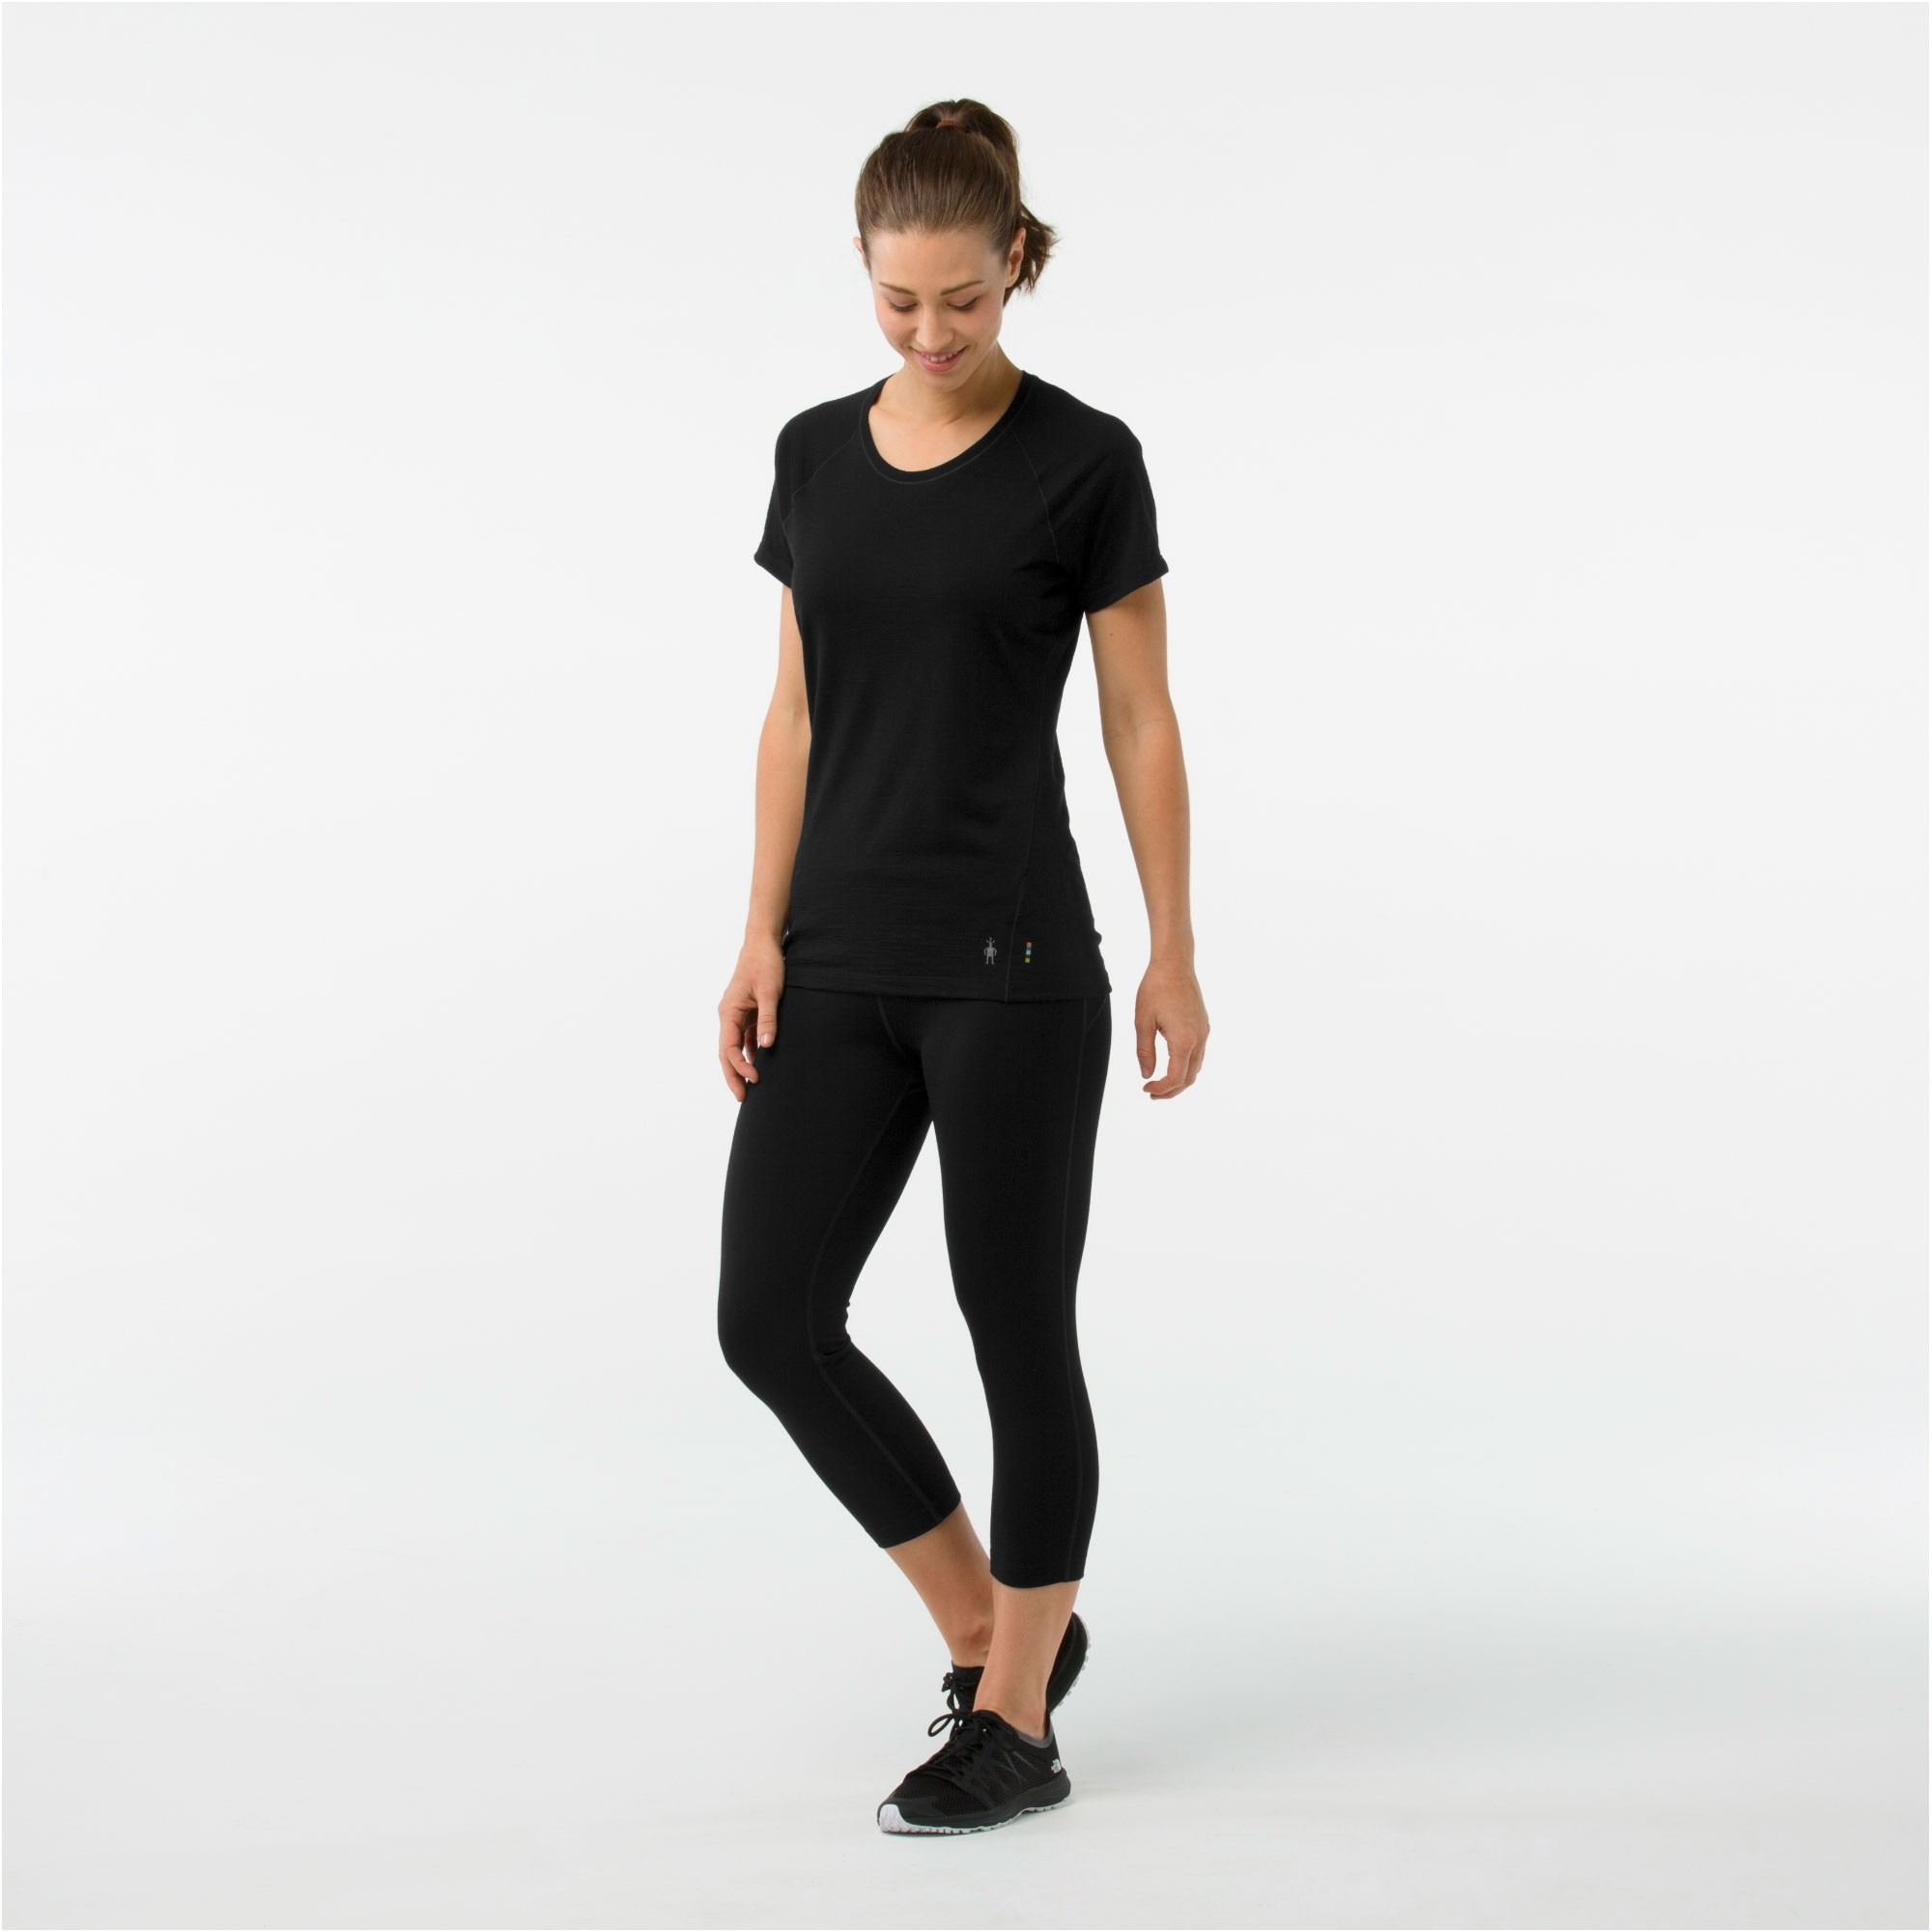 Smartwool Merino 150 Baselayer Short Sleeve - Womens - Black